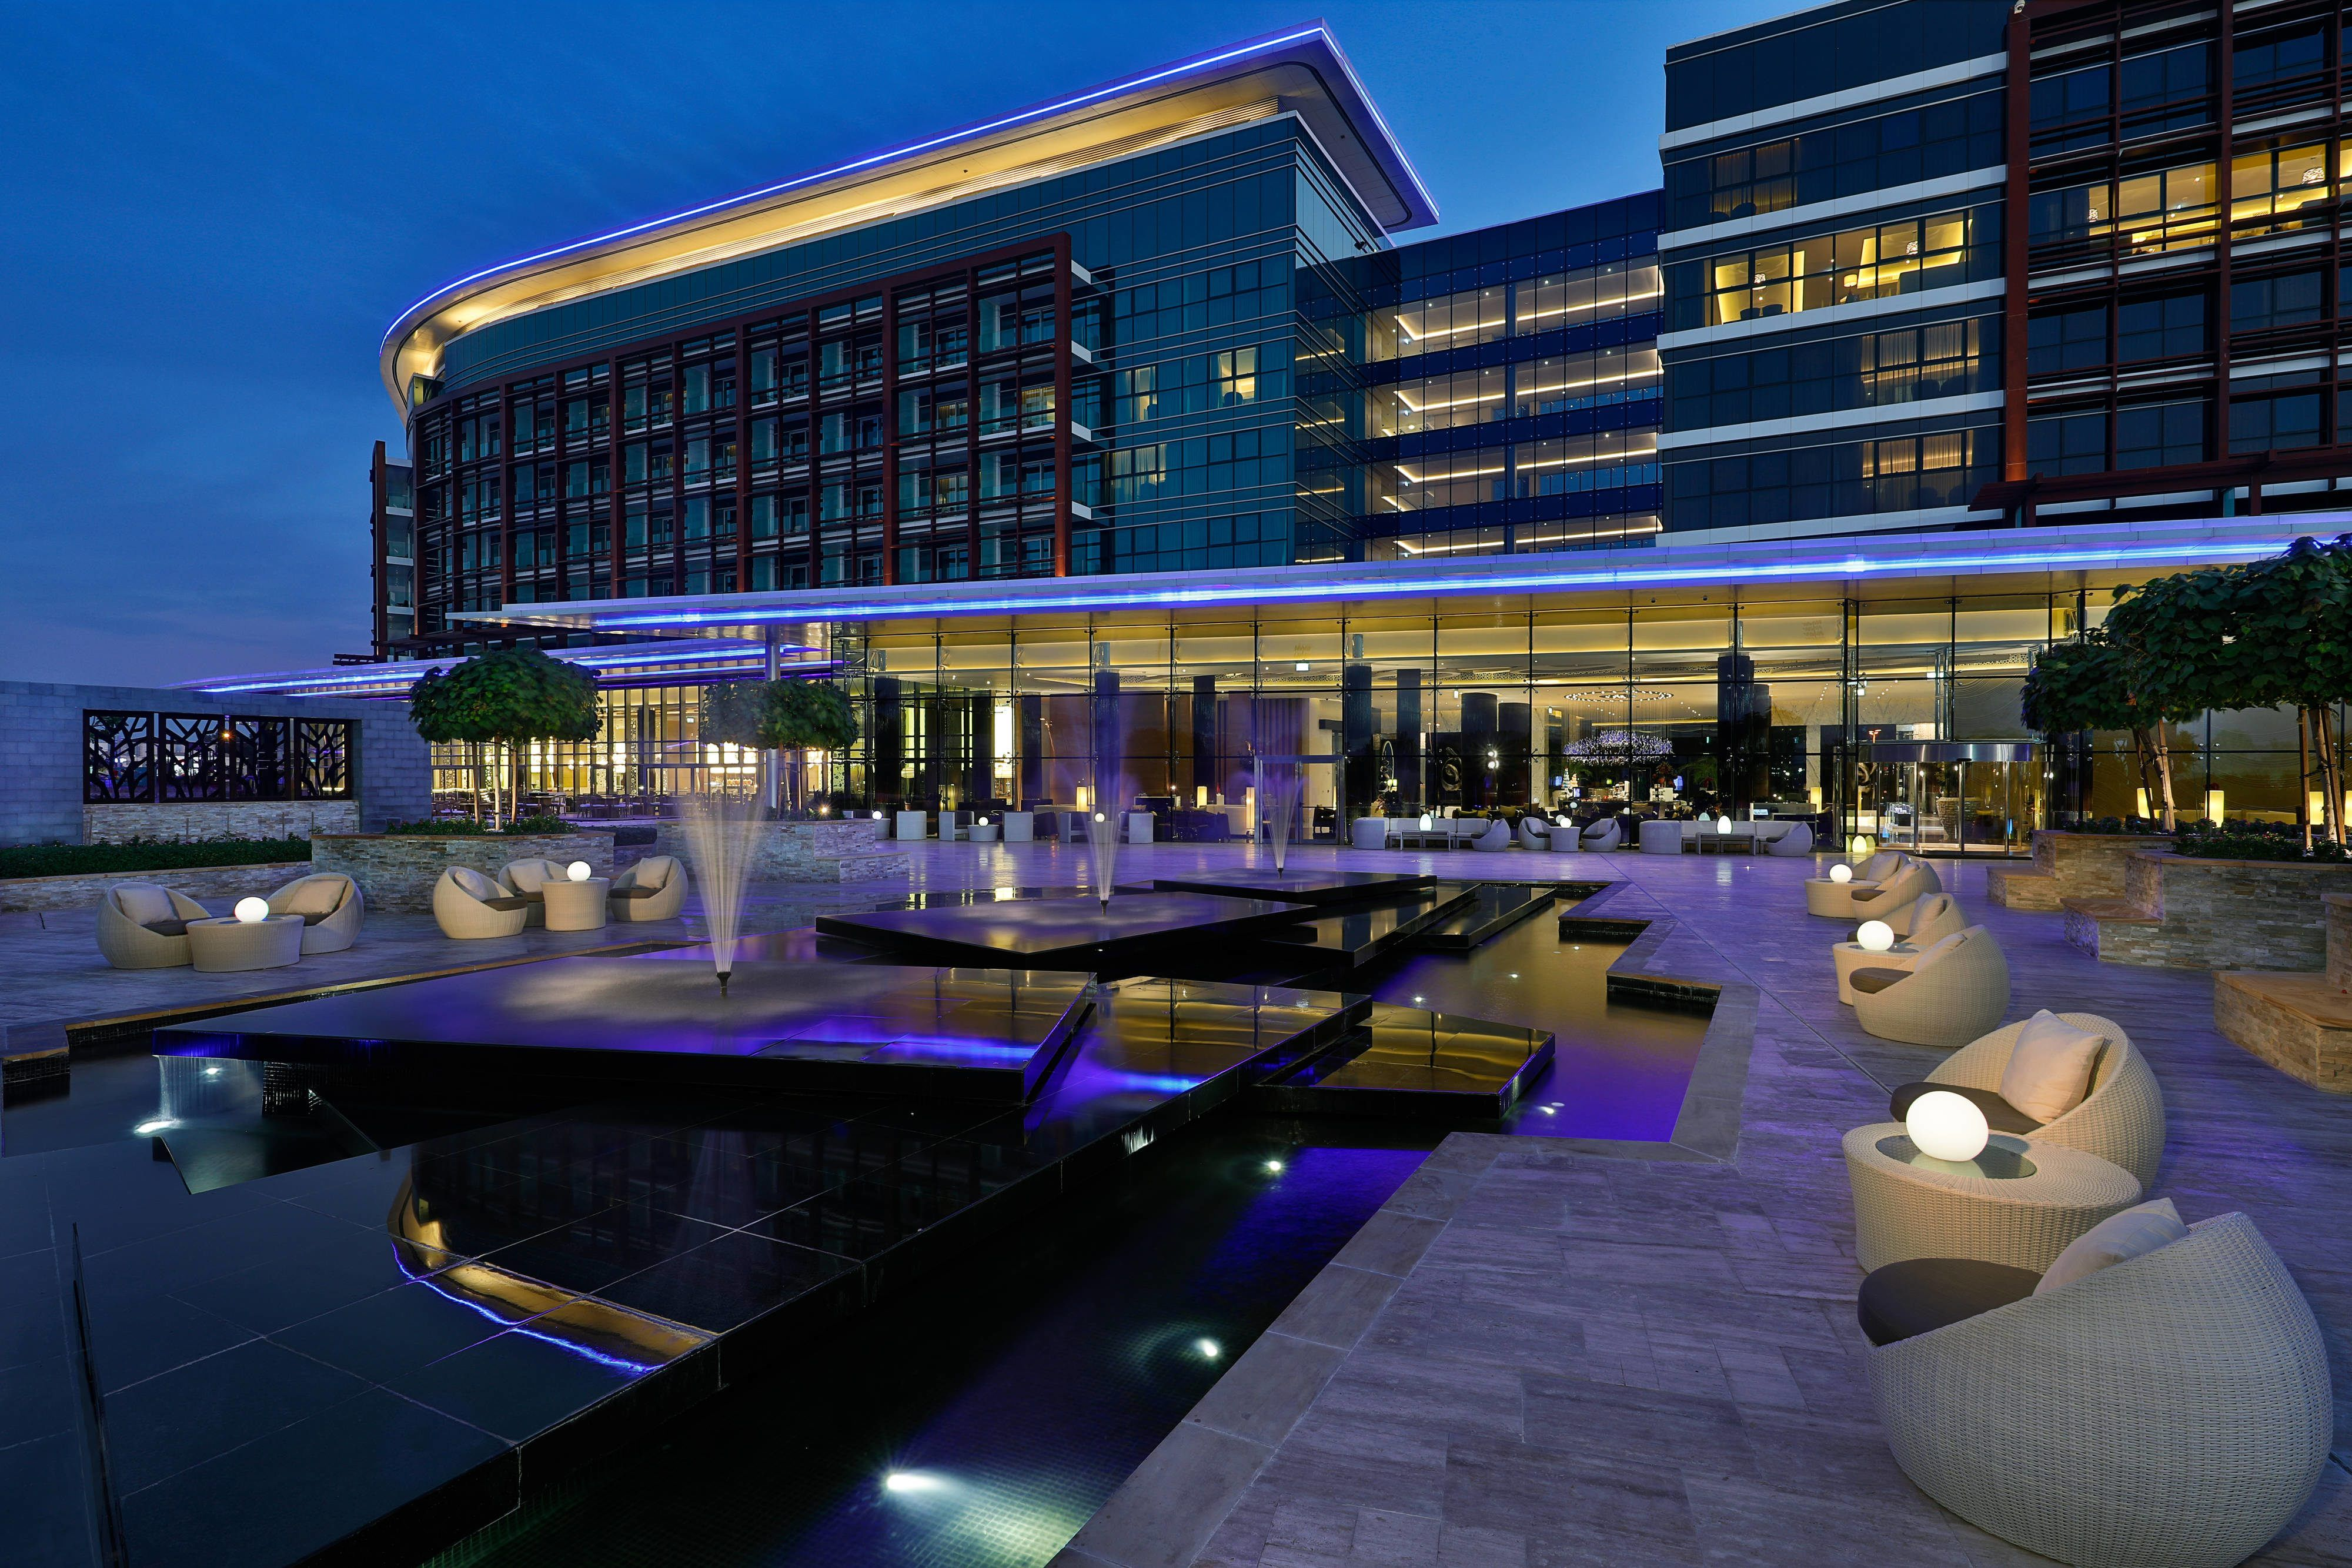 Marriott Hotel Al Forsan Abu Dhabi The Lobby Lounge Terrace Holidays Guestroom Enjoying Marriott Hotels Marriott Hotel